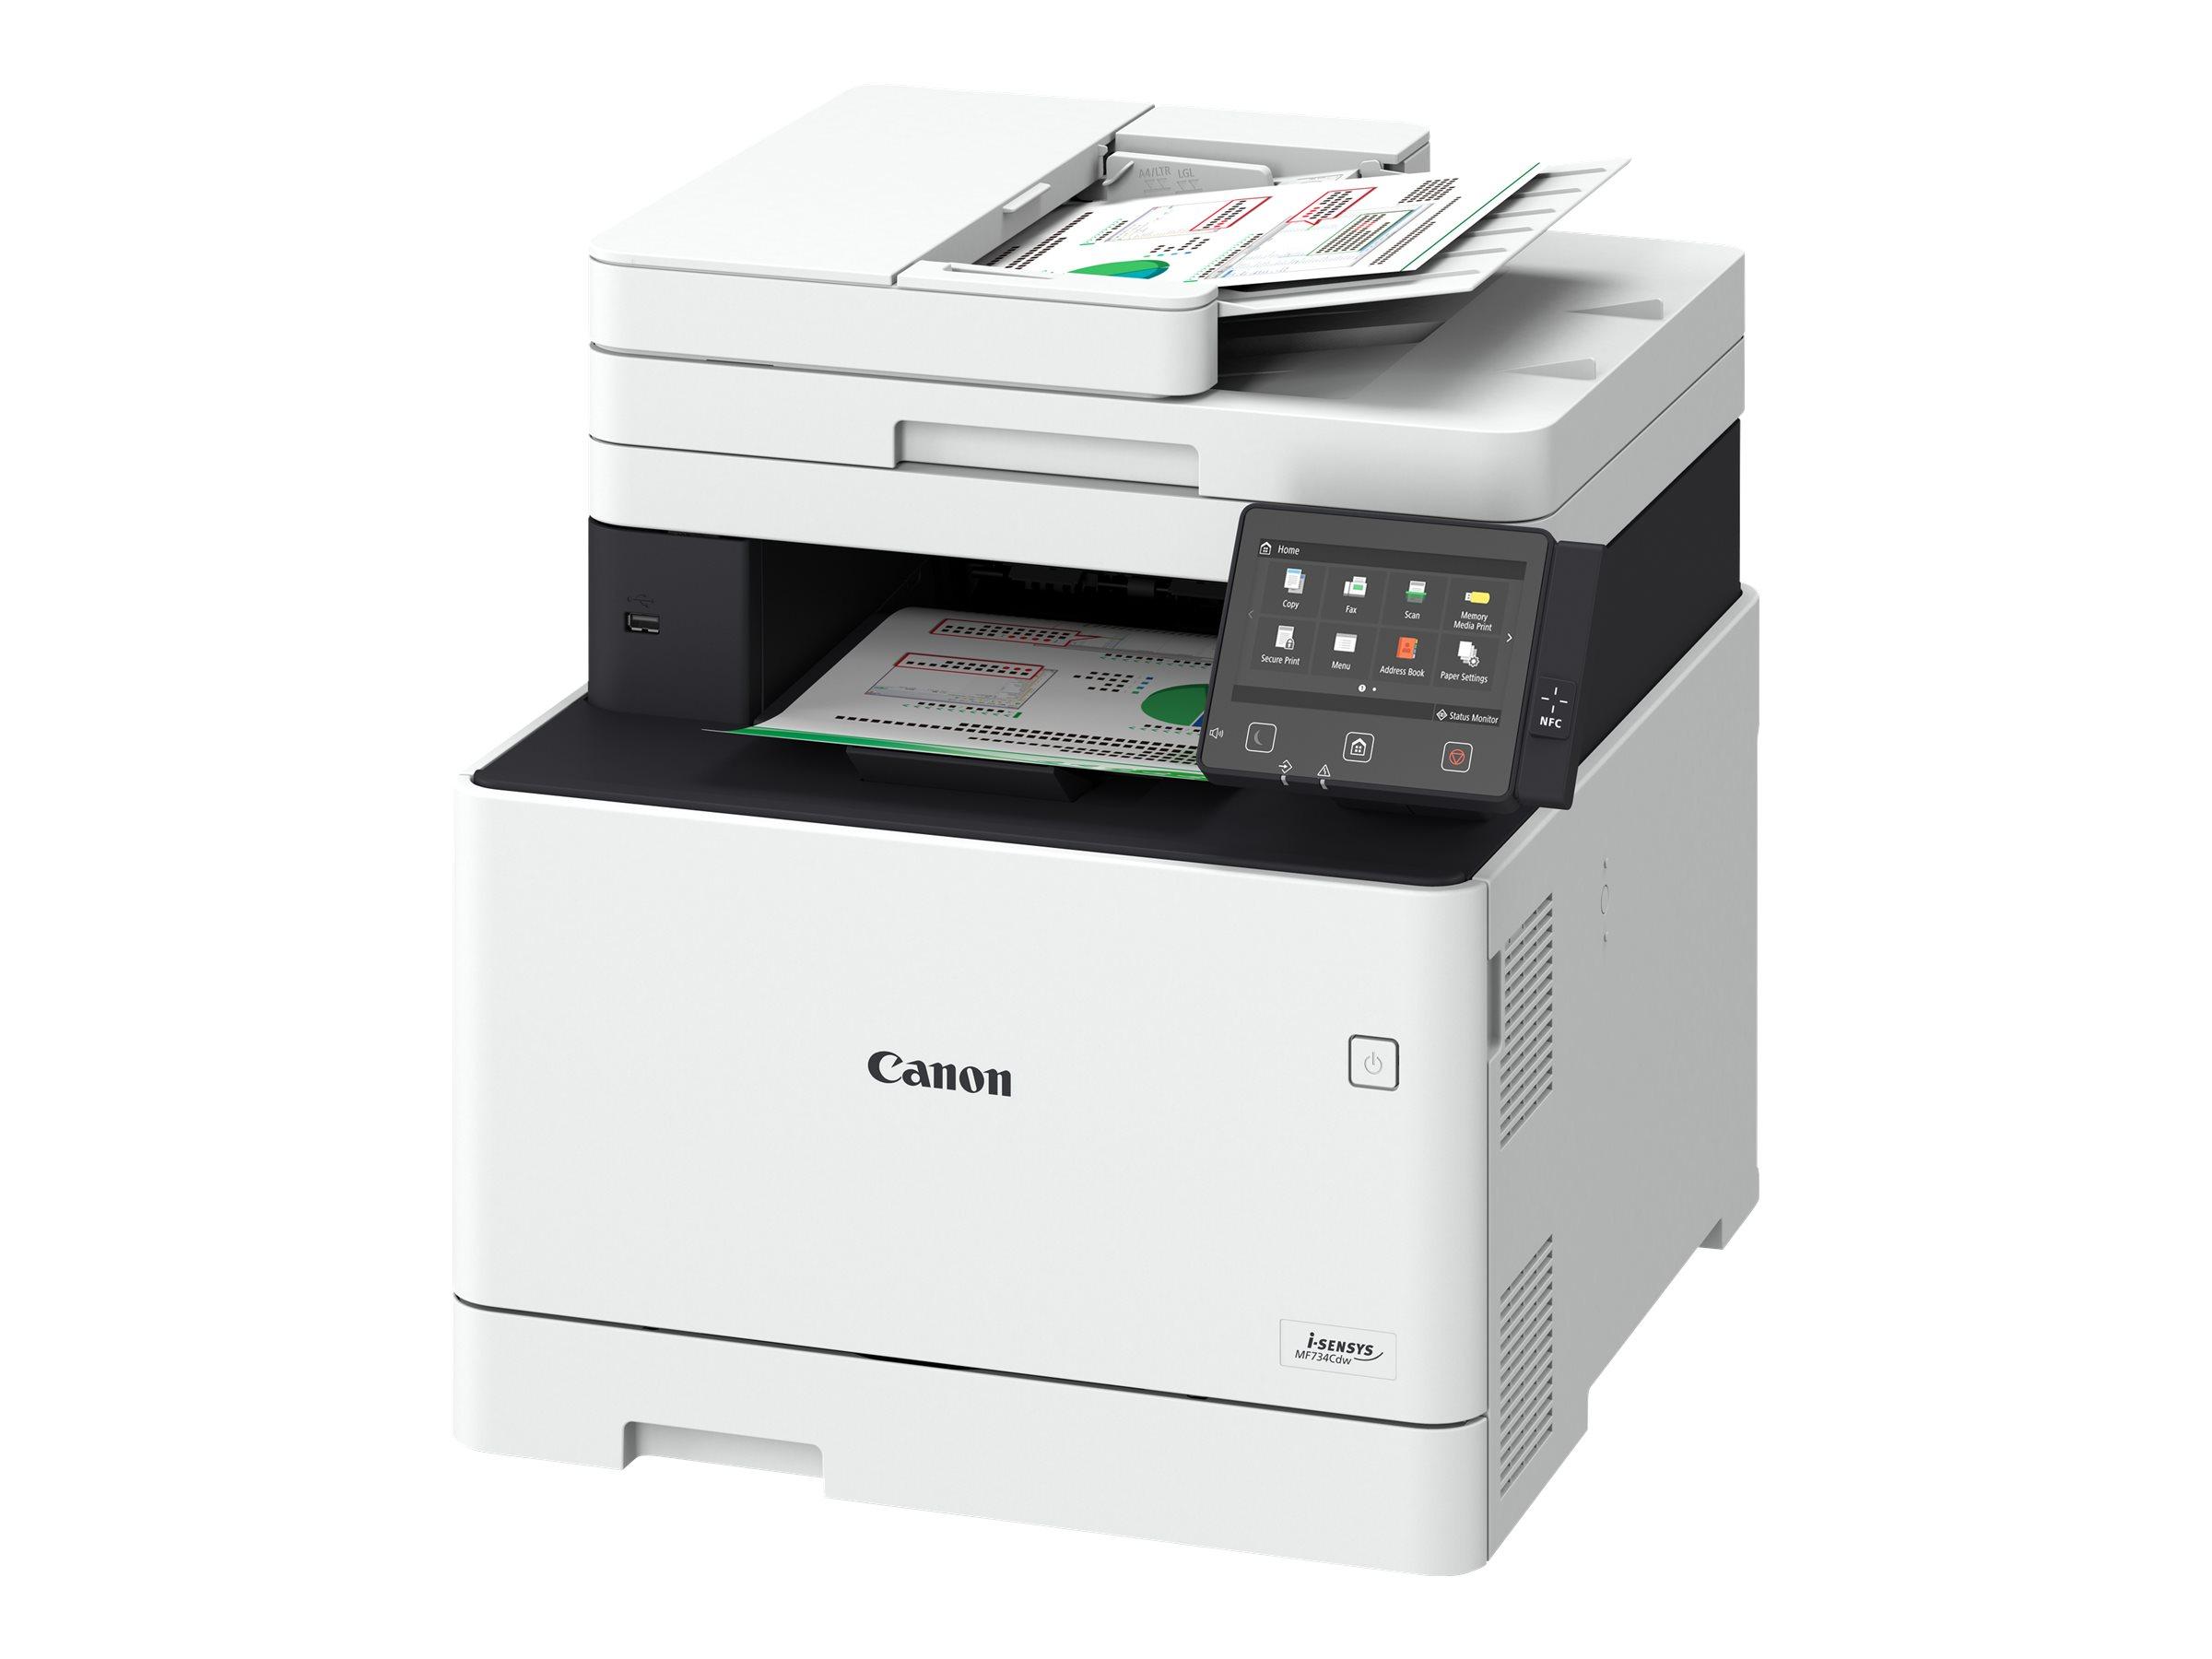 Canon i-SENSYS MF734Cdw - Multifunktionsdrucker - Farbe - Laser - A4 (210 x 297 mm)